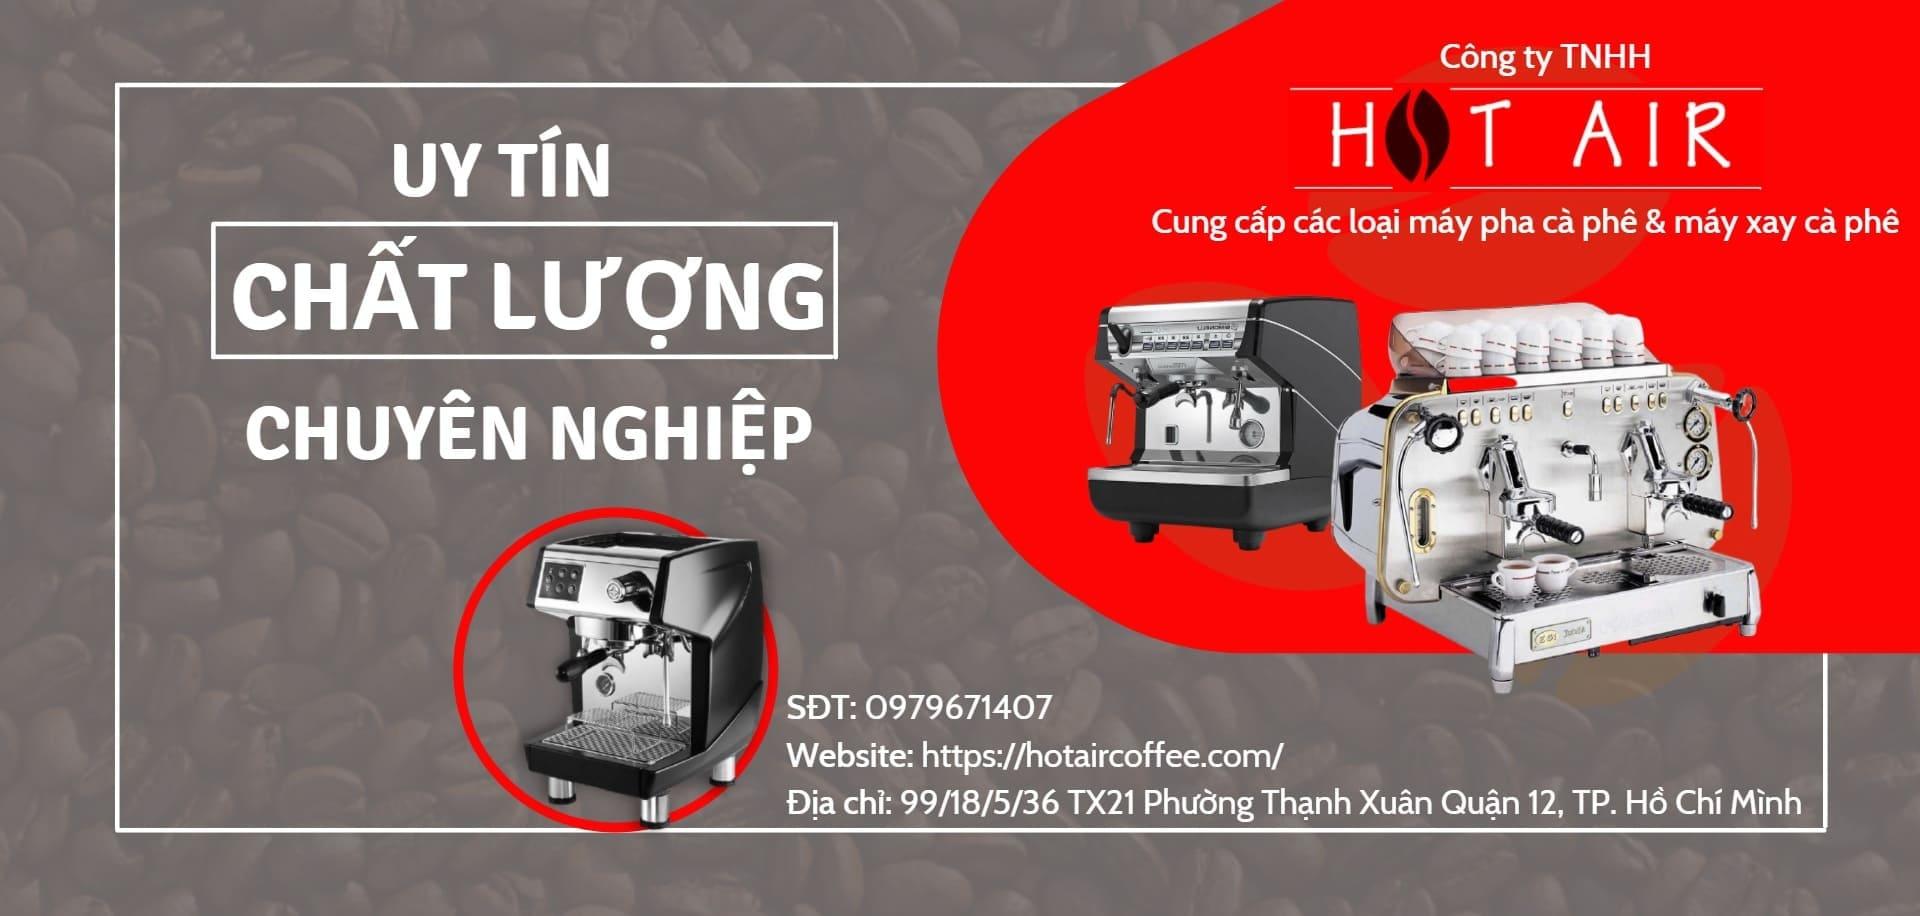 HOT AIR Coffee (@hotaircoffee) Cover Image